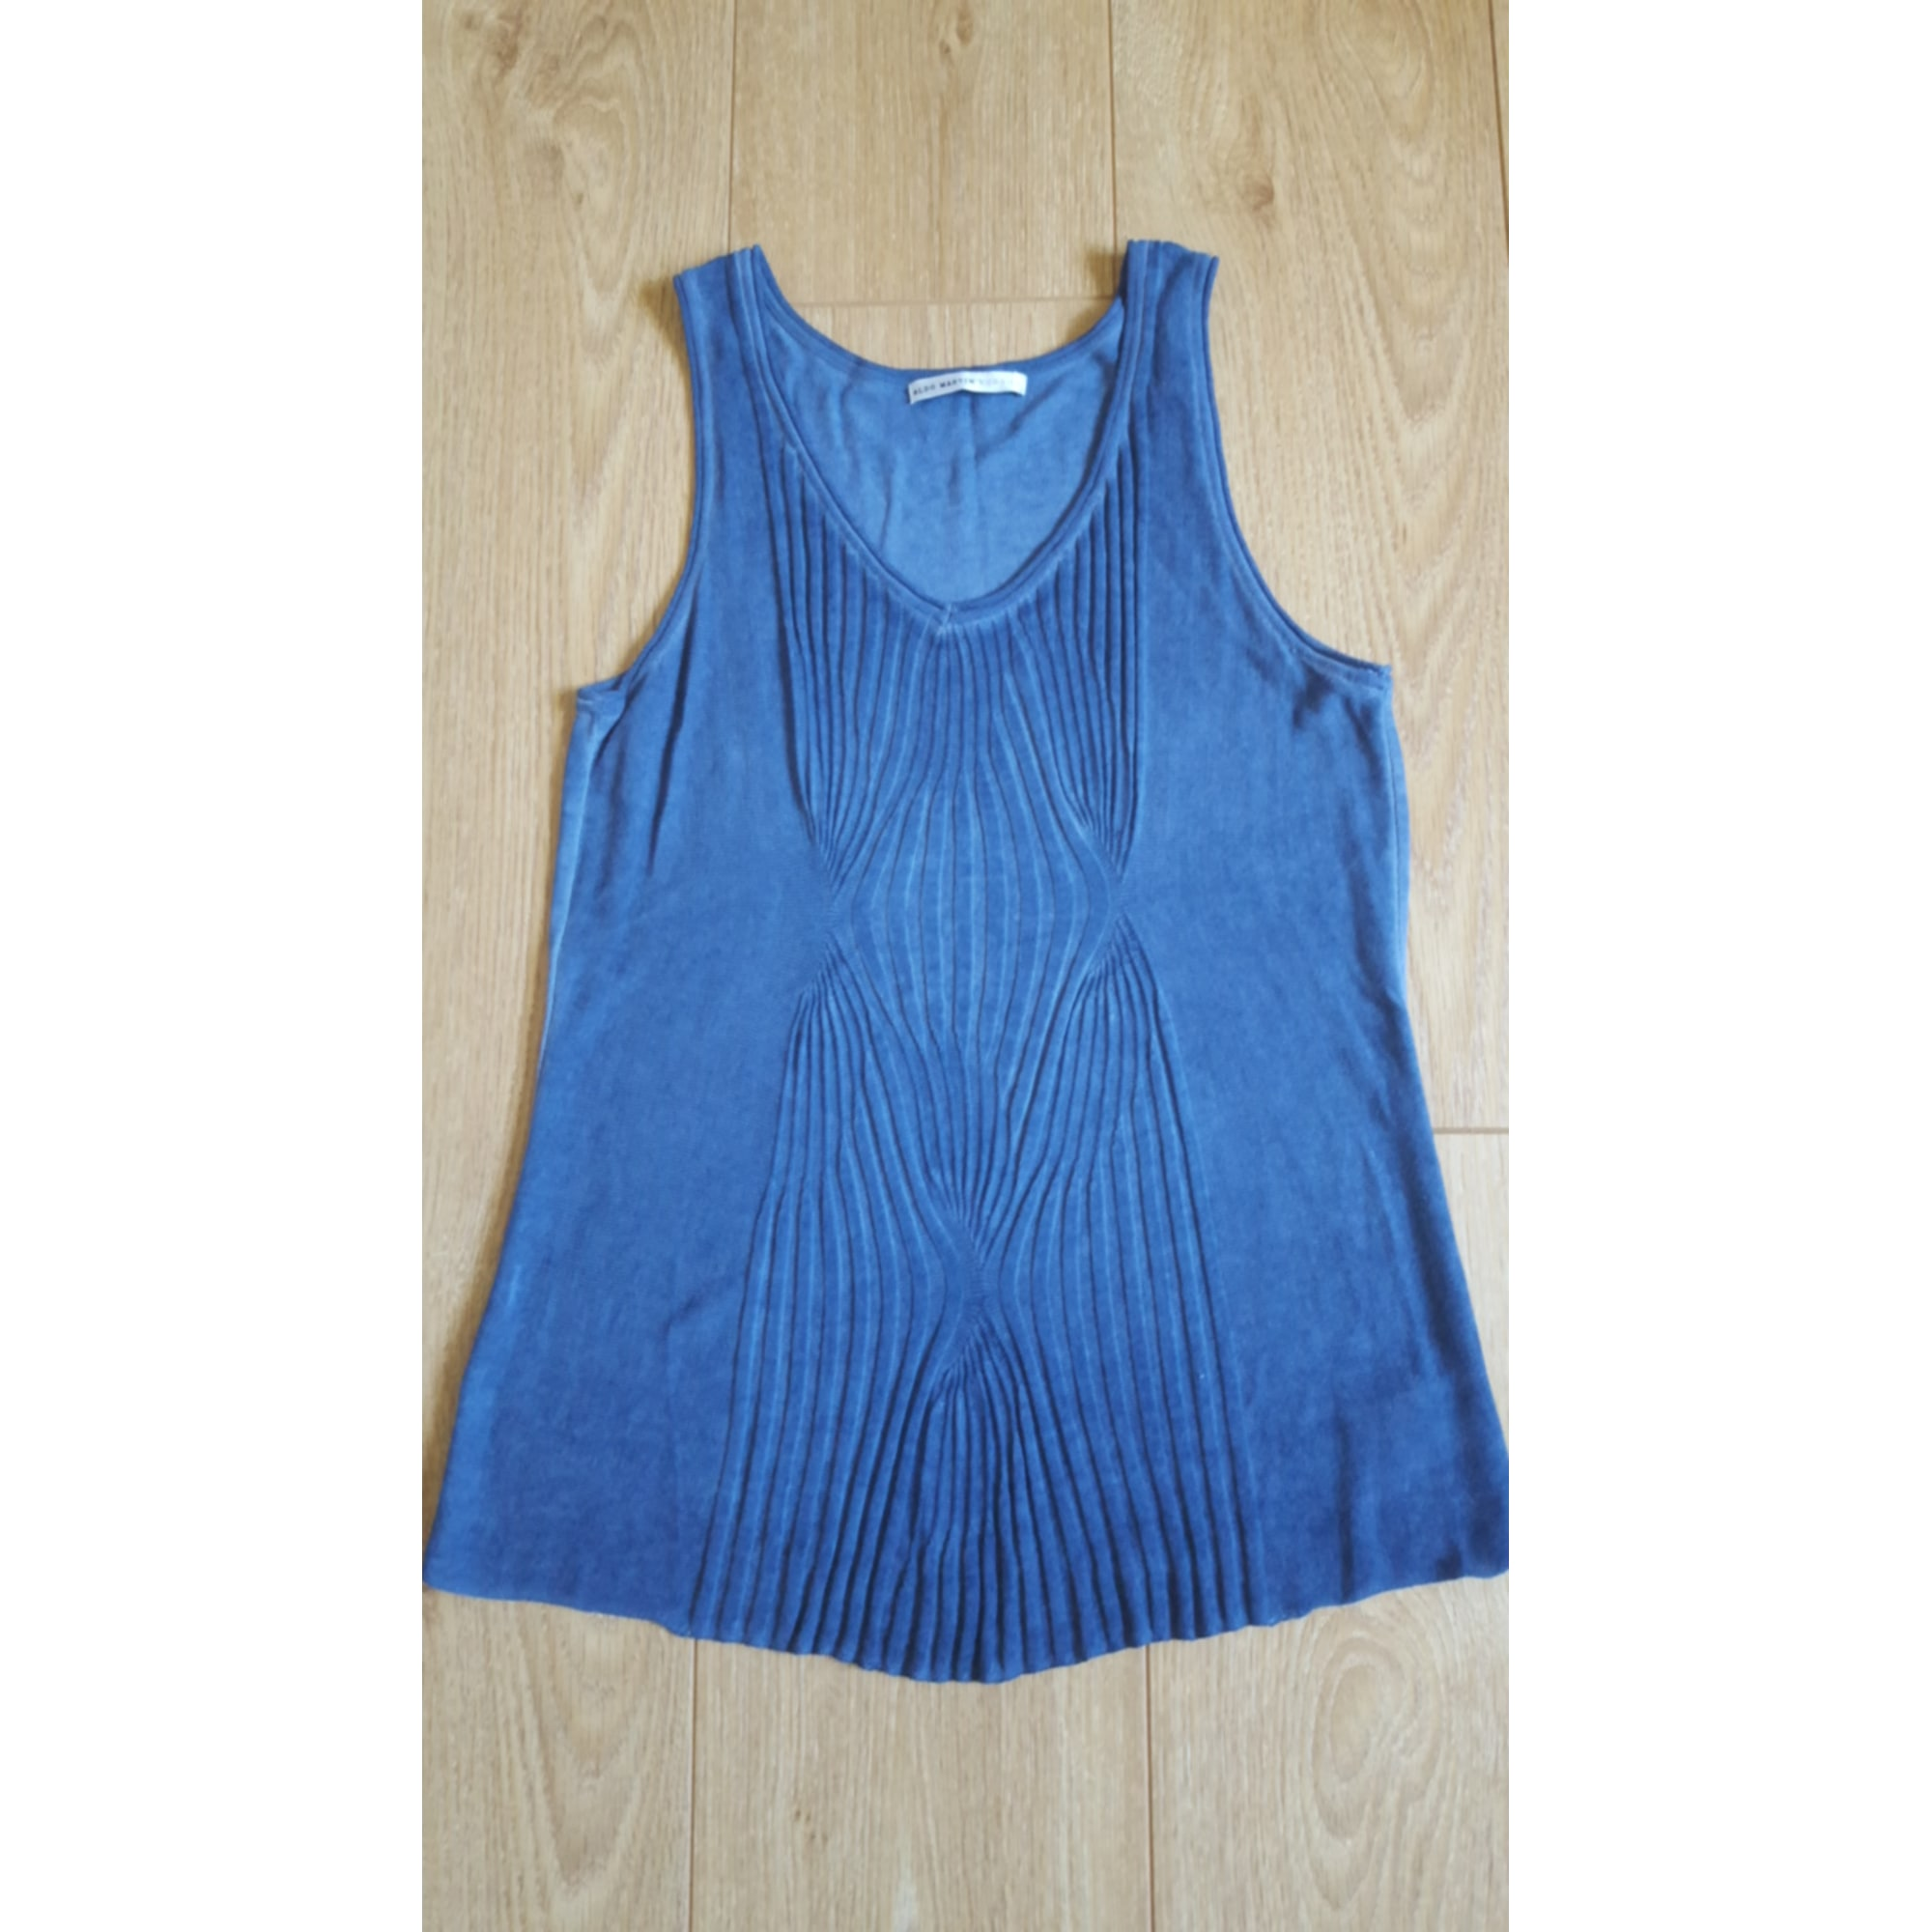 Débardeur ALDO MARTIN'S Bleu, bleu marine, bleu turquoise